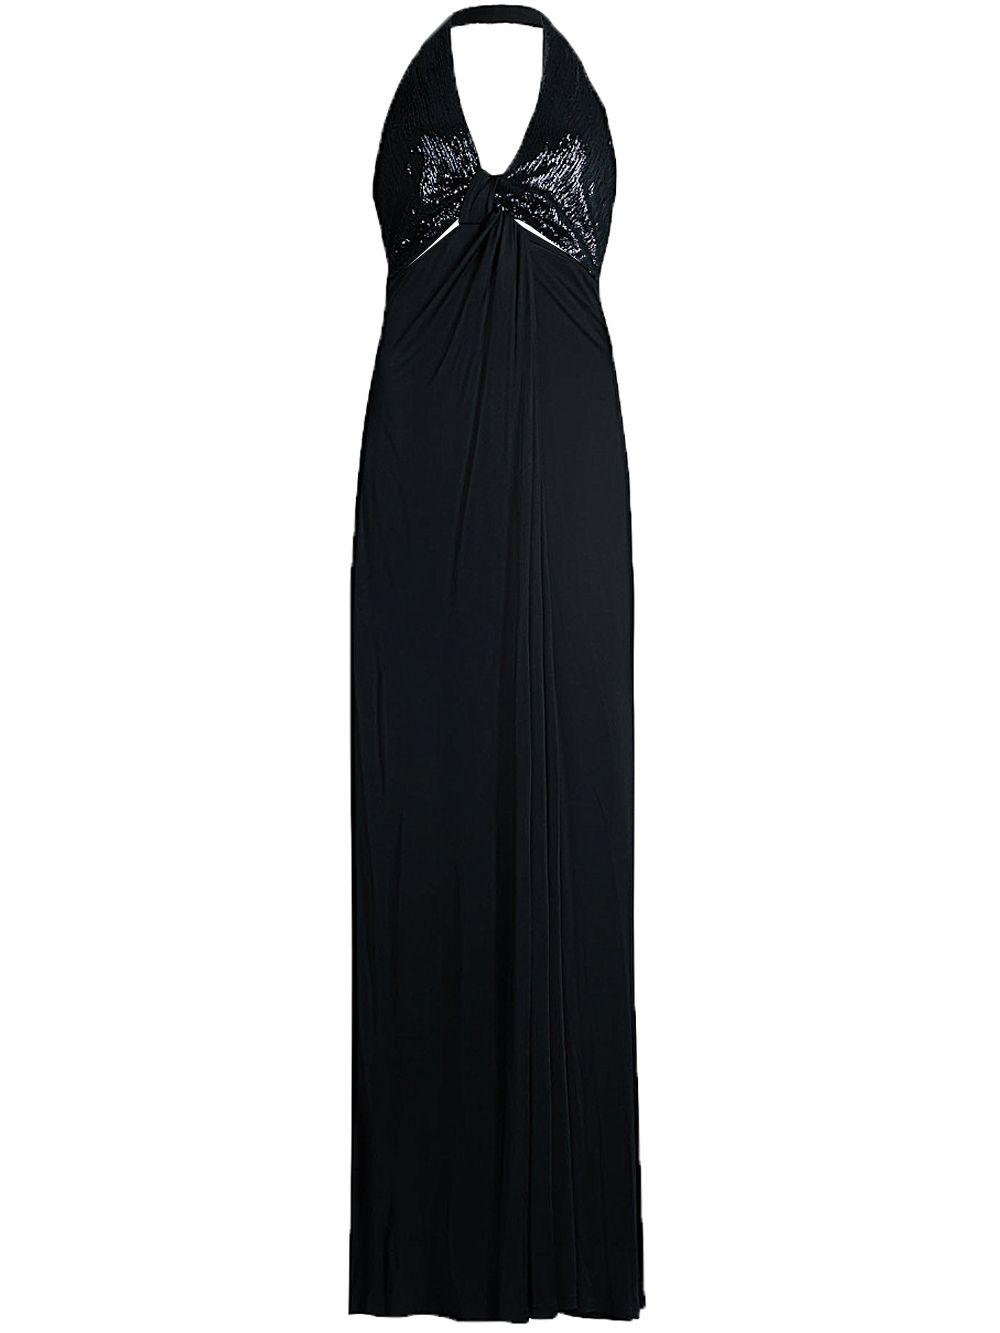 Contrast Twist Dress